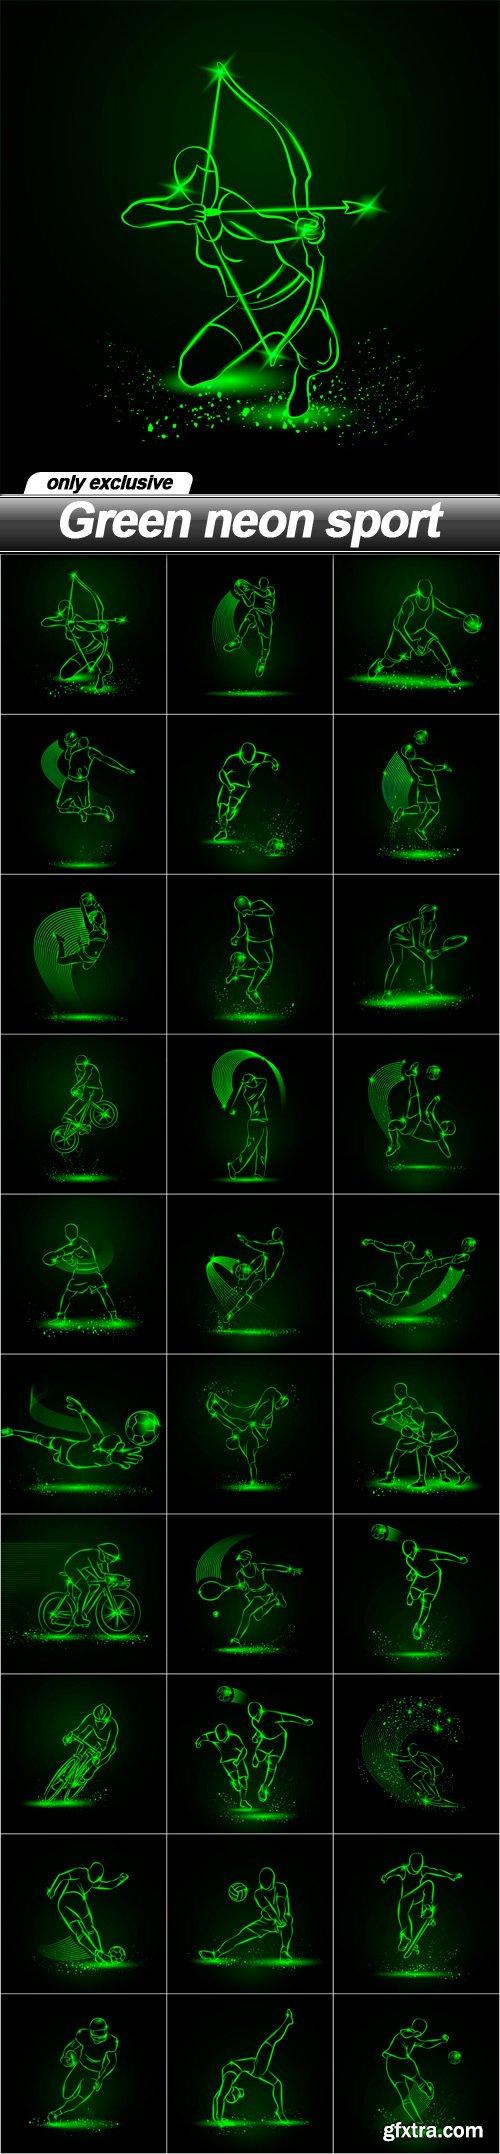 Green neon sport - 30 EPS